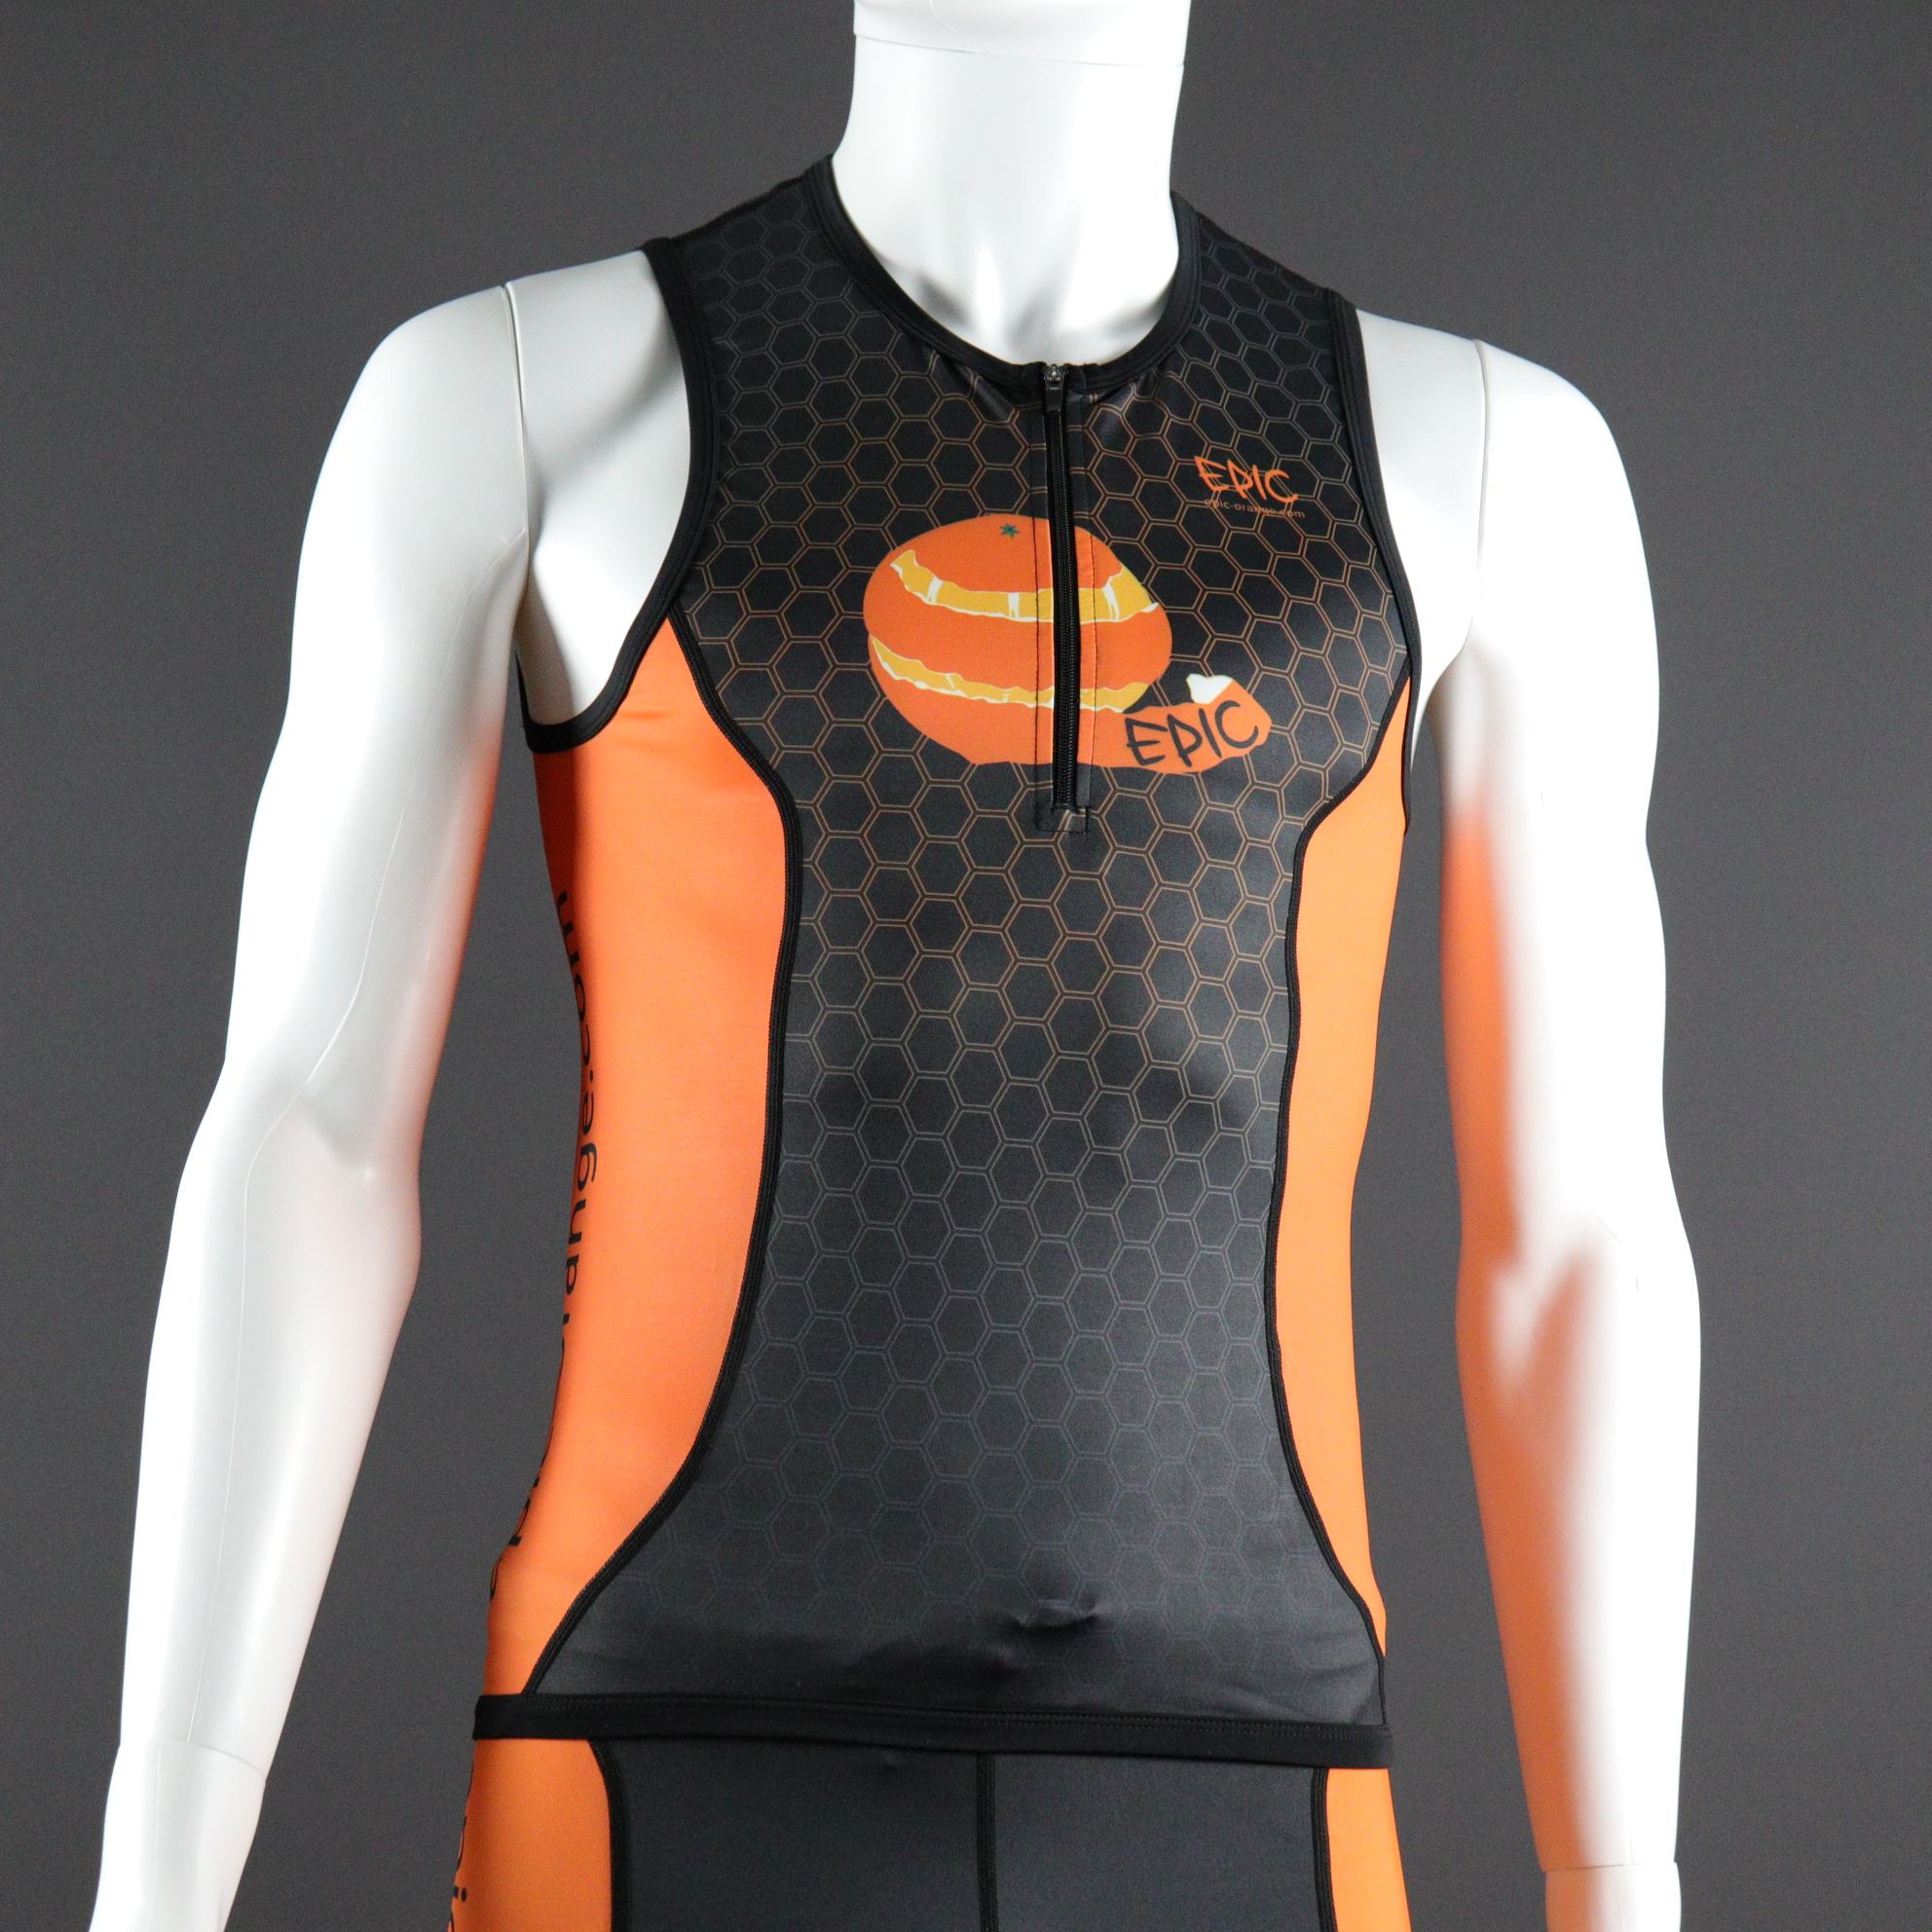 Custom Printed Sprint Triathlon Tops